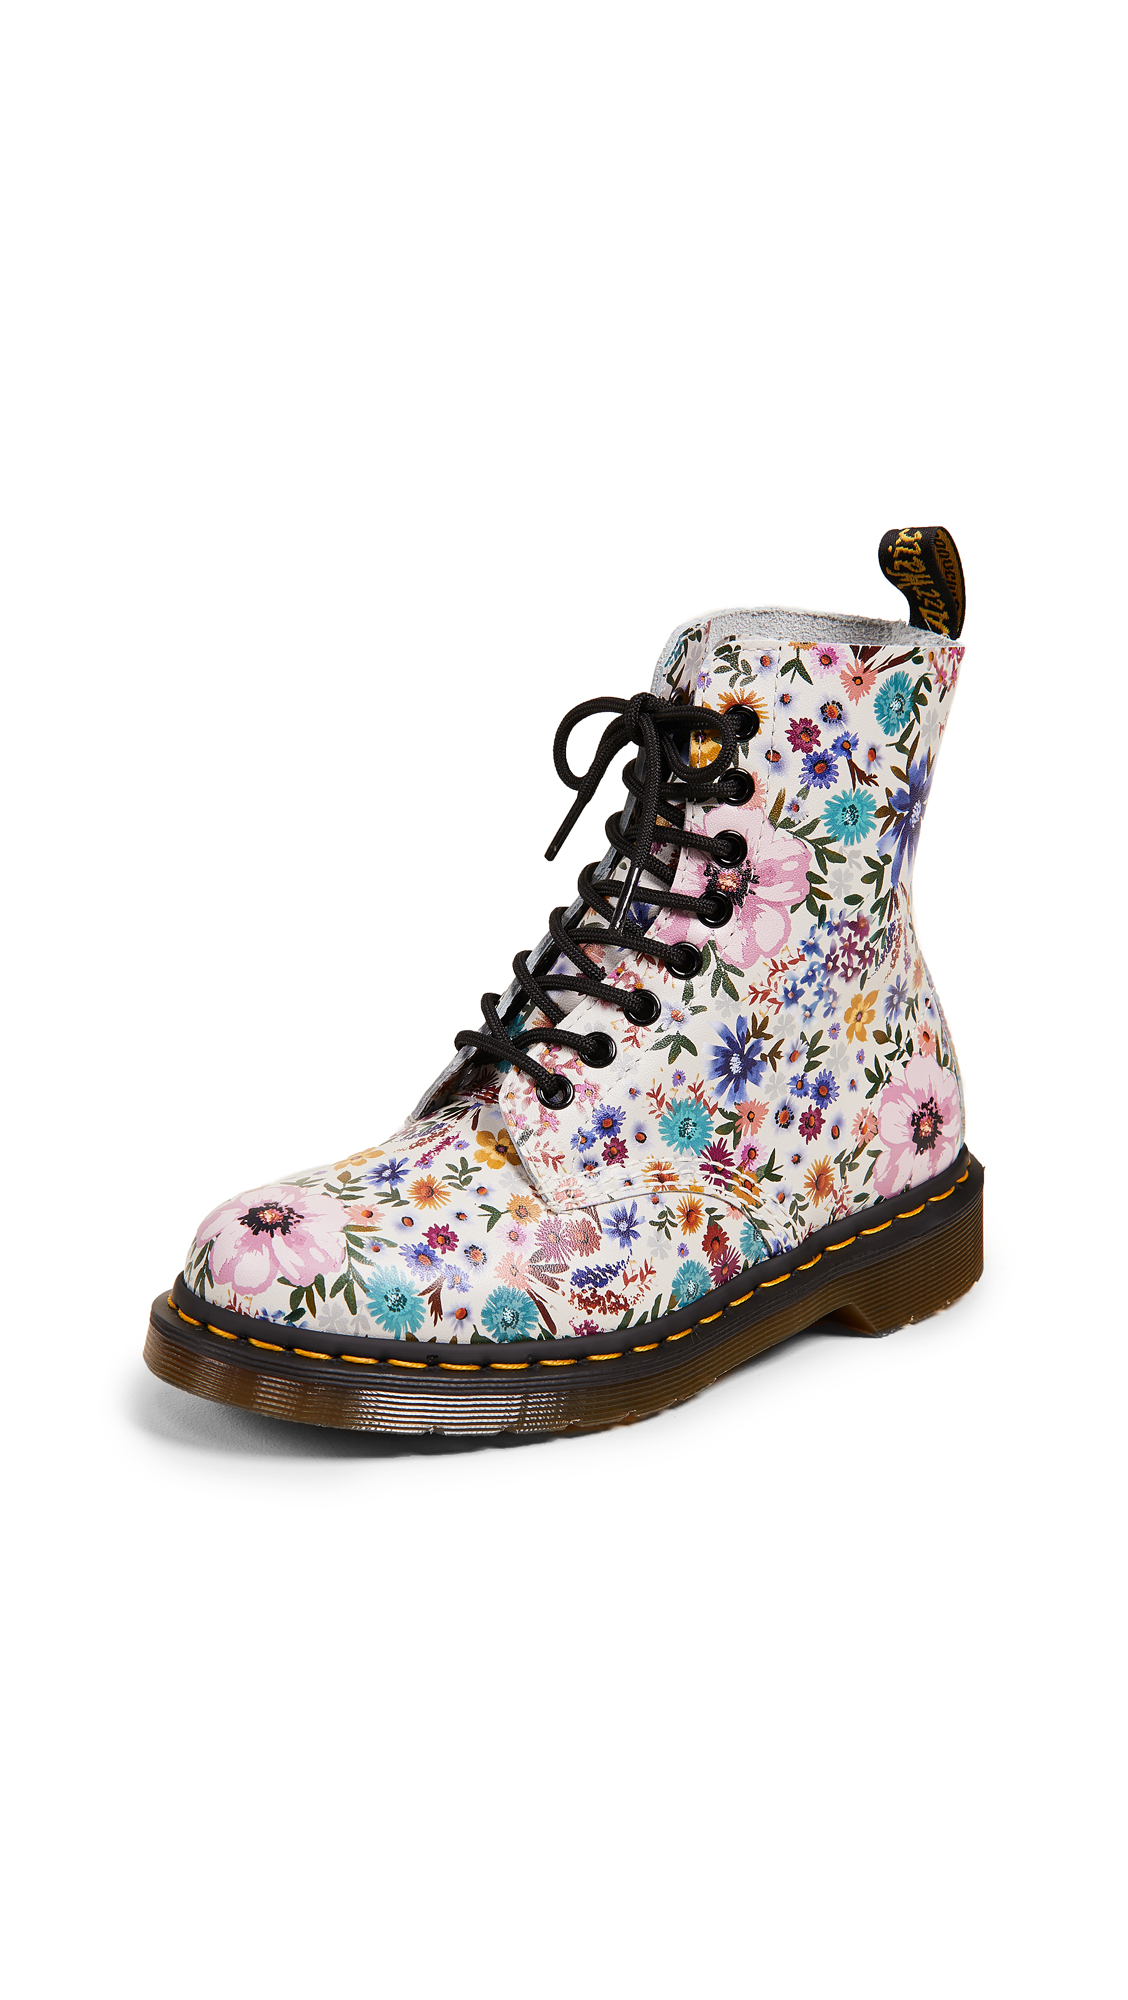 Dr. Martens Pascal WL 8 Eye Boots - Bone/Mallow Pink